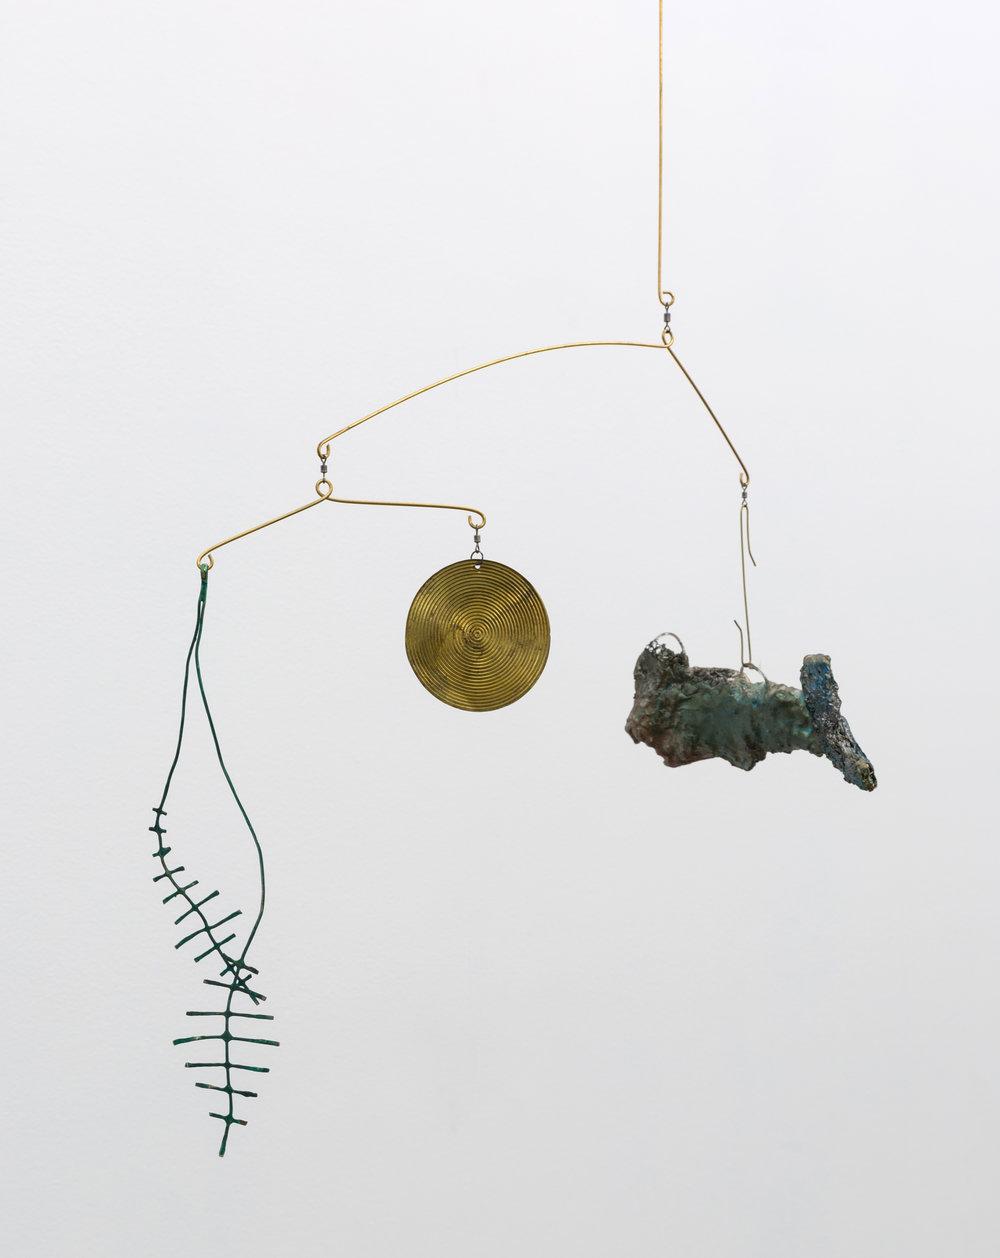 Angler 2 , 2018 brass, copper, steel, paster, wax, paint, earring 26 x 19 x 3 in